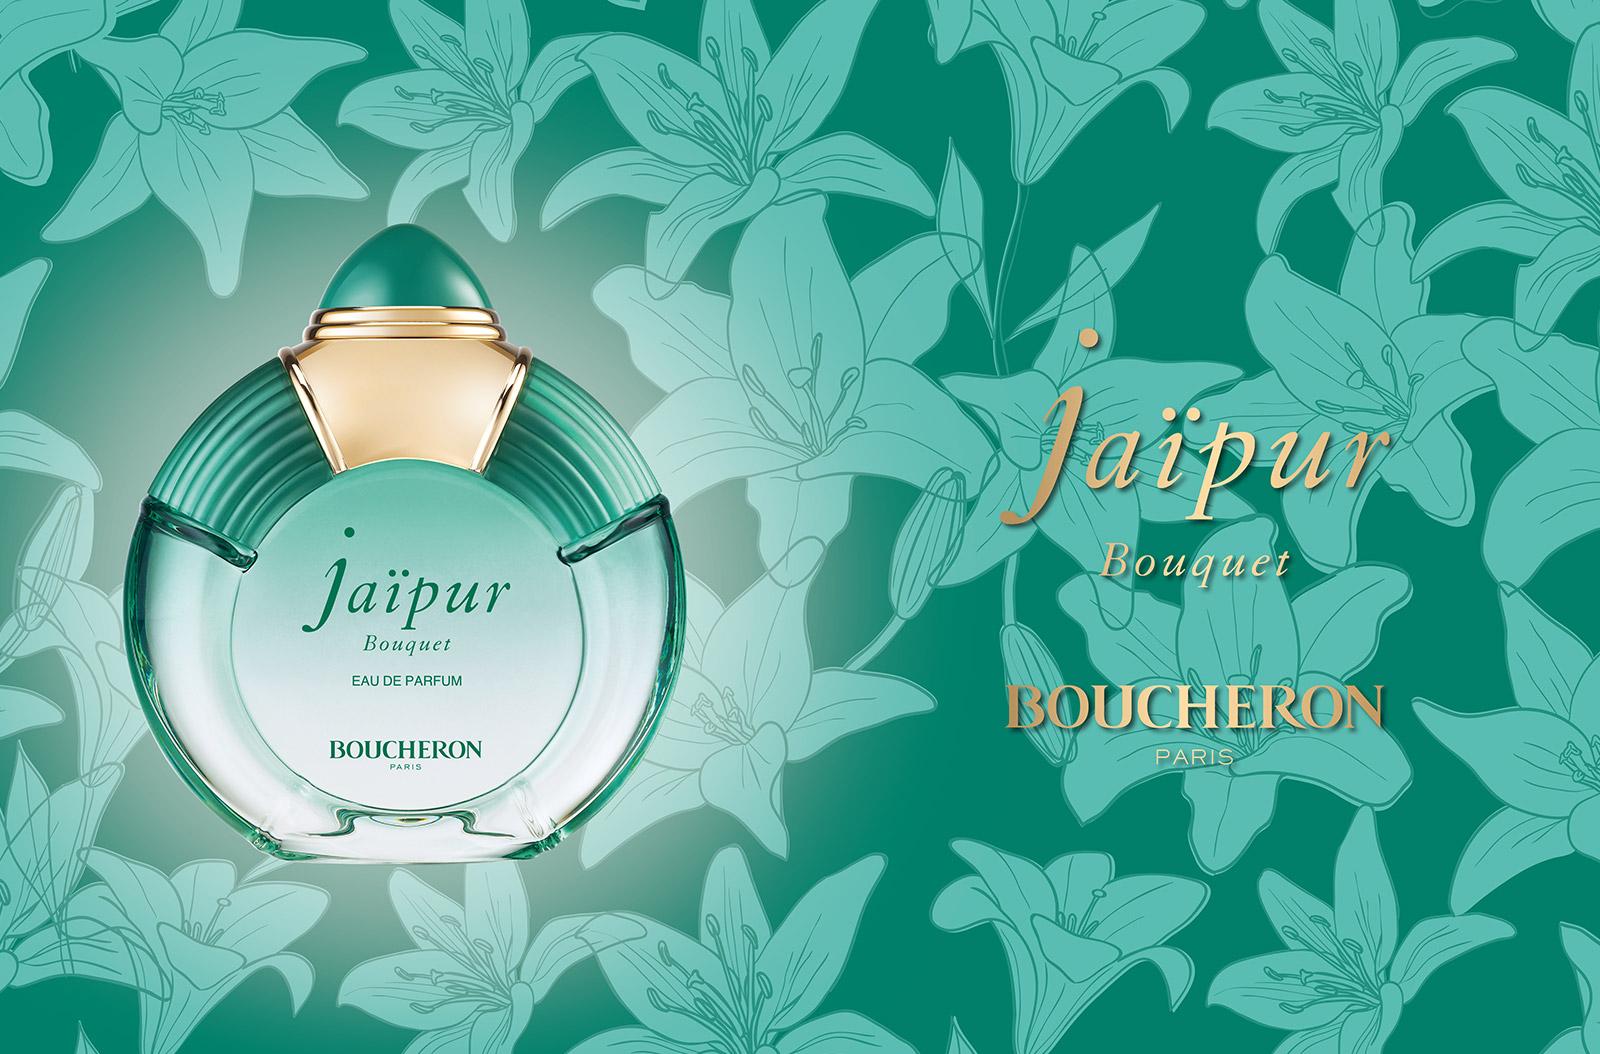 boucheron-jaipur-bouquet-g1